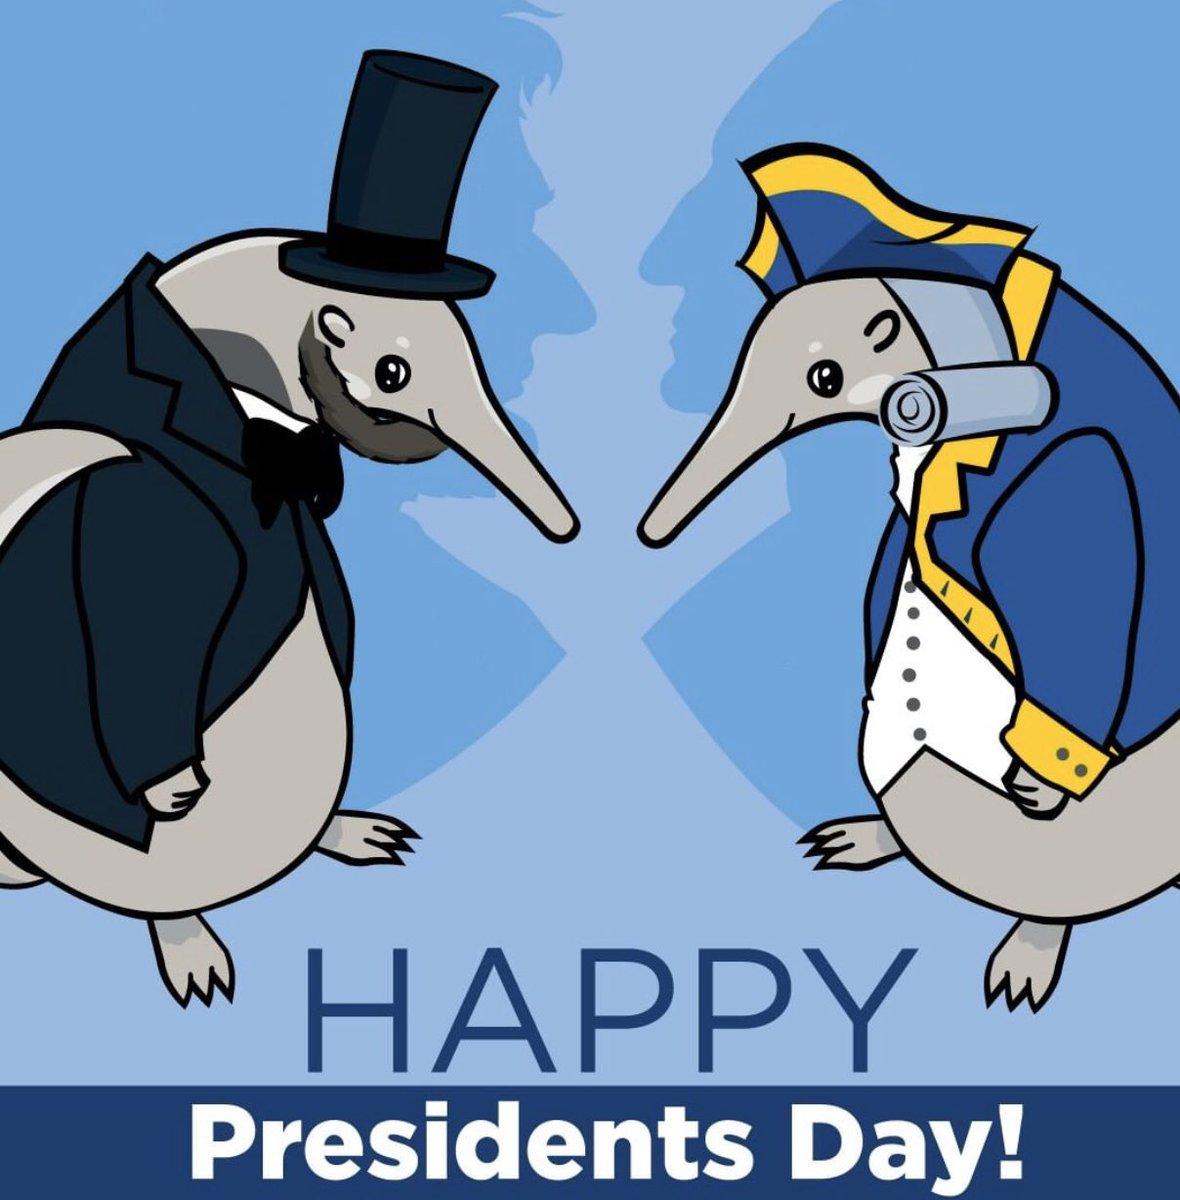 Happy Presidents Day! 💙💛 https://t.co/tvJoRU7CKG